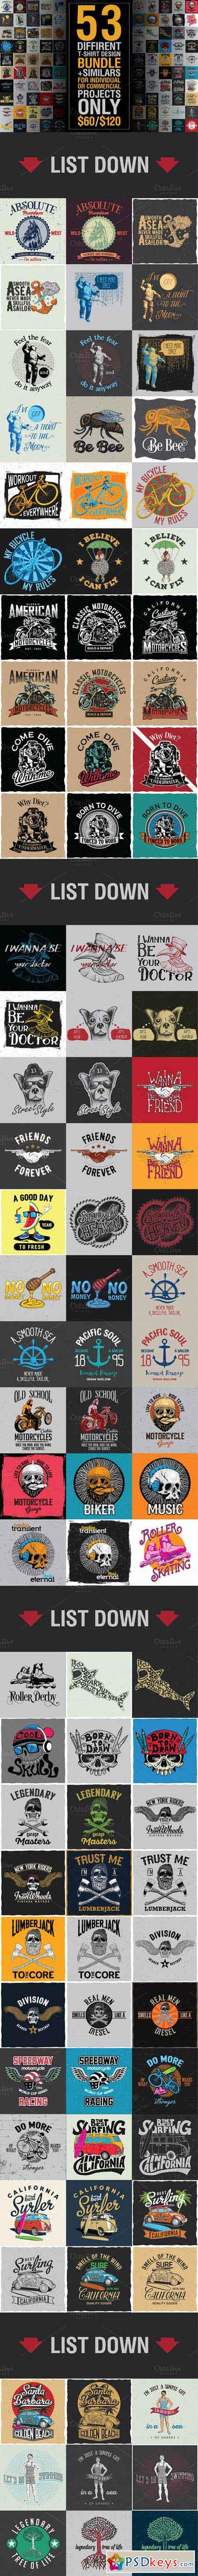 T shirt design 7 25xeps - T Shirt Design Big Bundle 473387